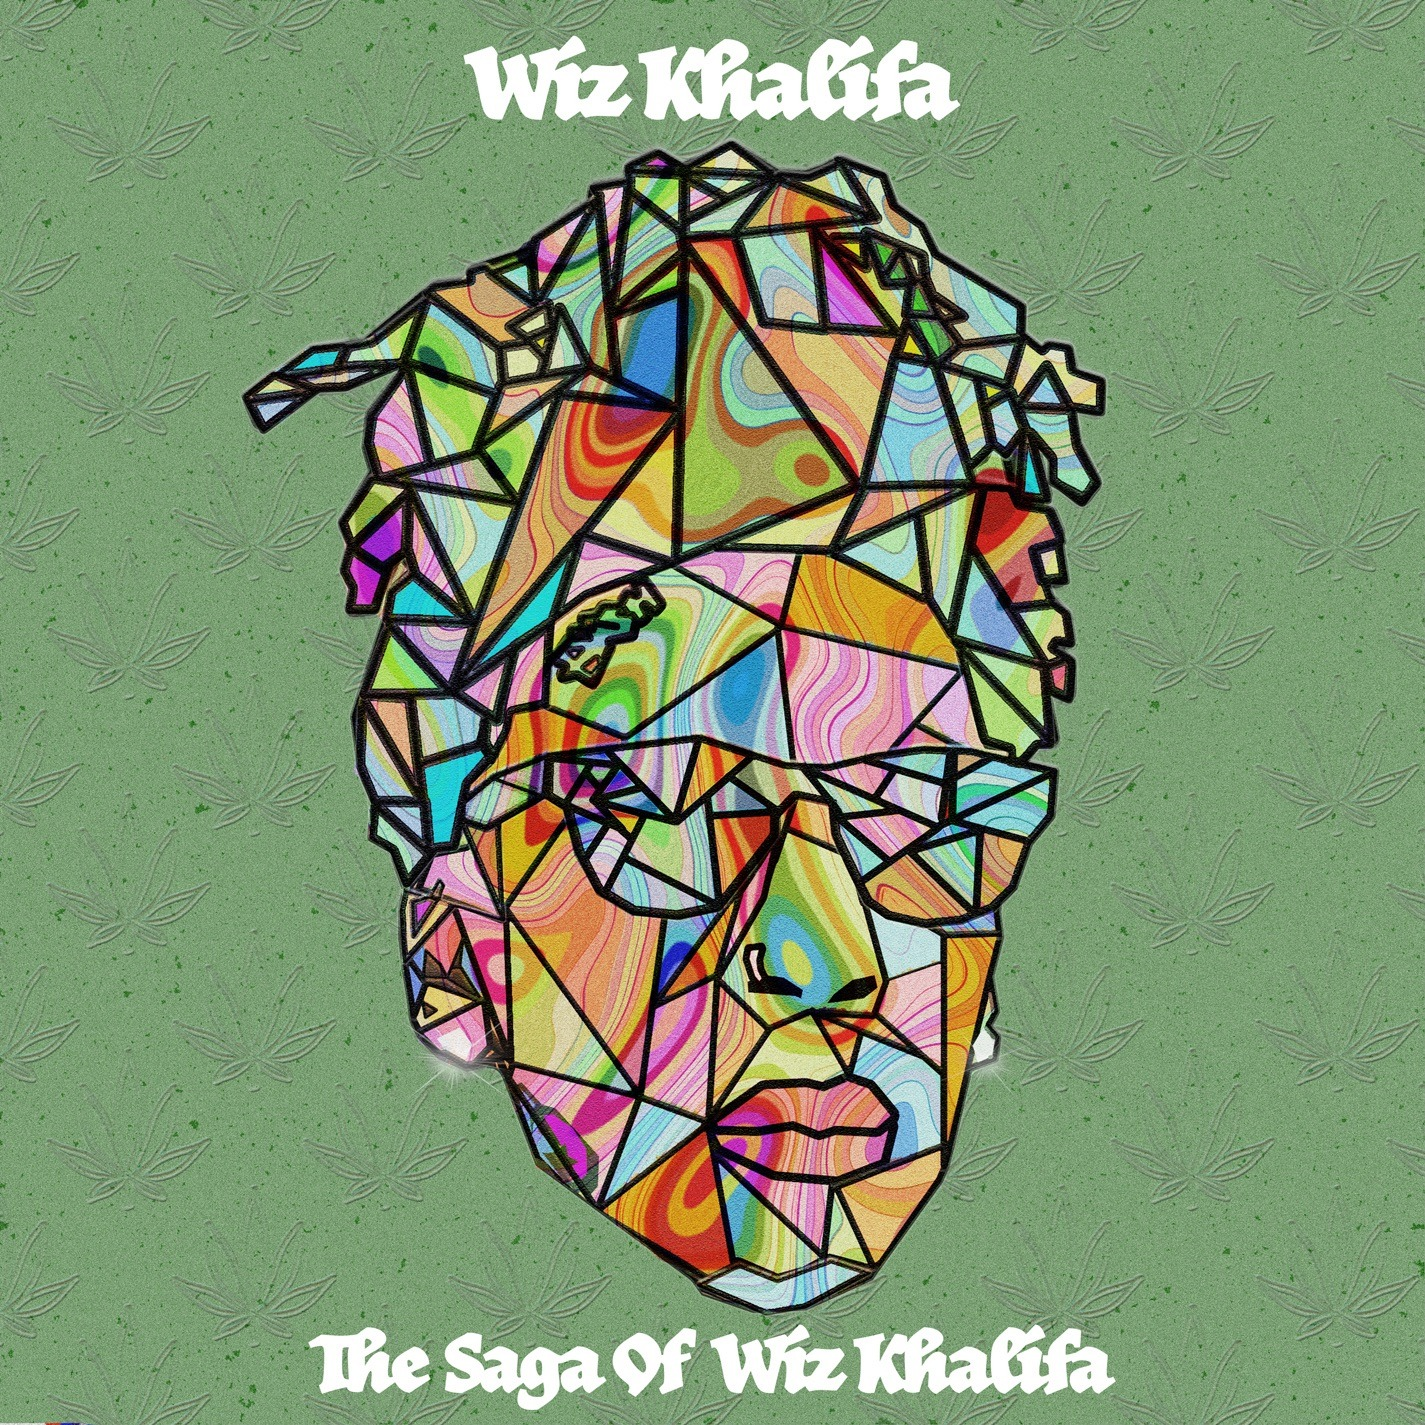 Wiz Khalifa - The Saga of Wiz Khalifa